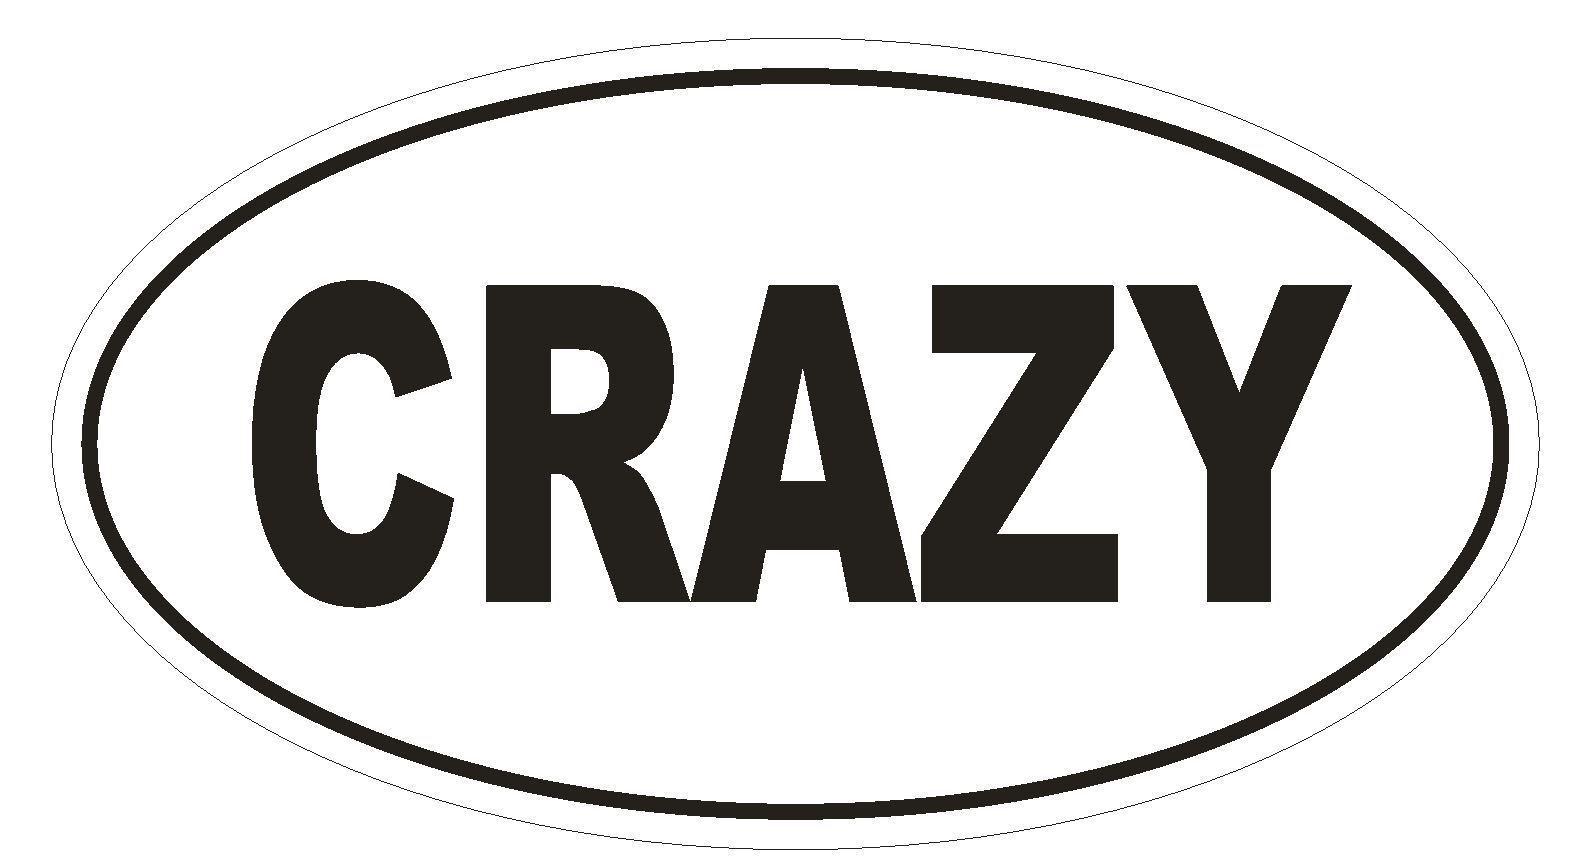 CRAZY Oval Bumper Sticker or Helmet Sticker D1736 Euro Oval - $1.39 - $75.00